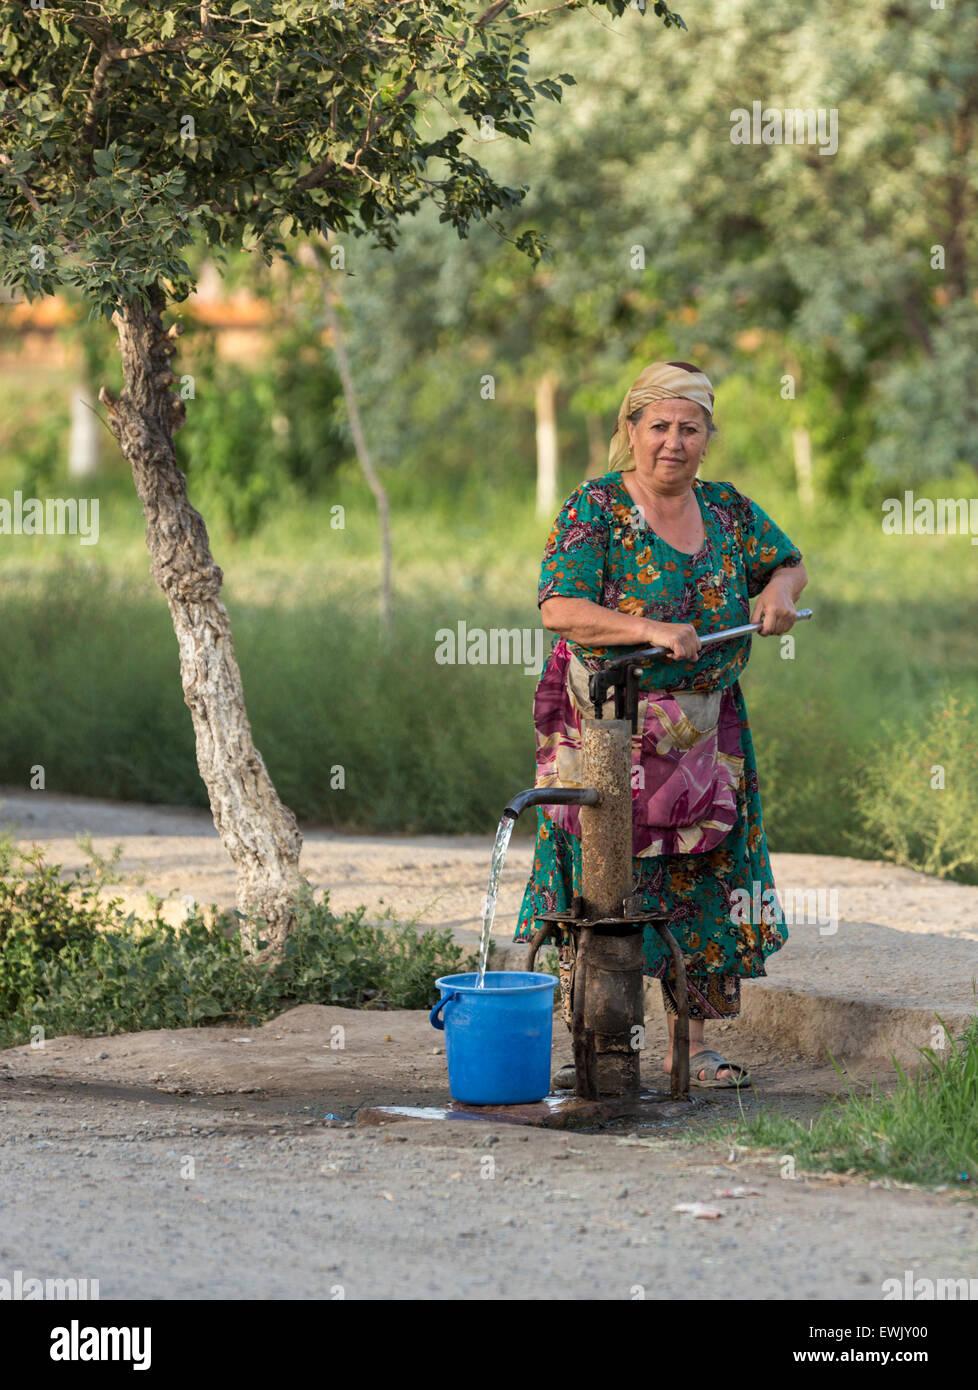 Woman pumping water in Khiva, Uzbekistan - Stock Image